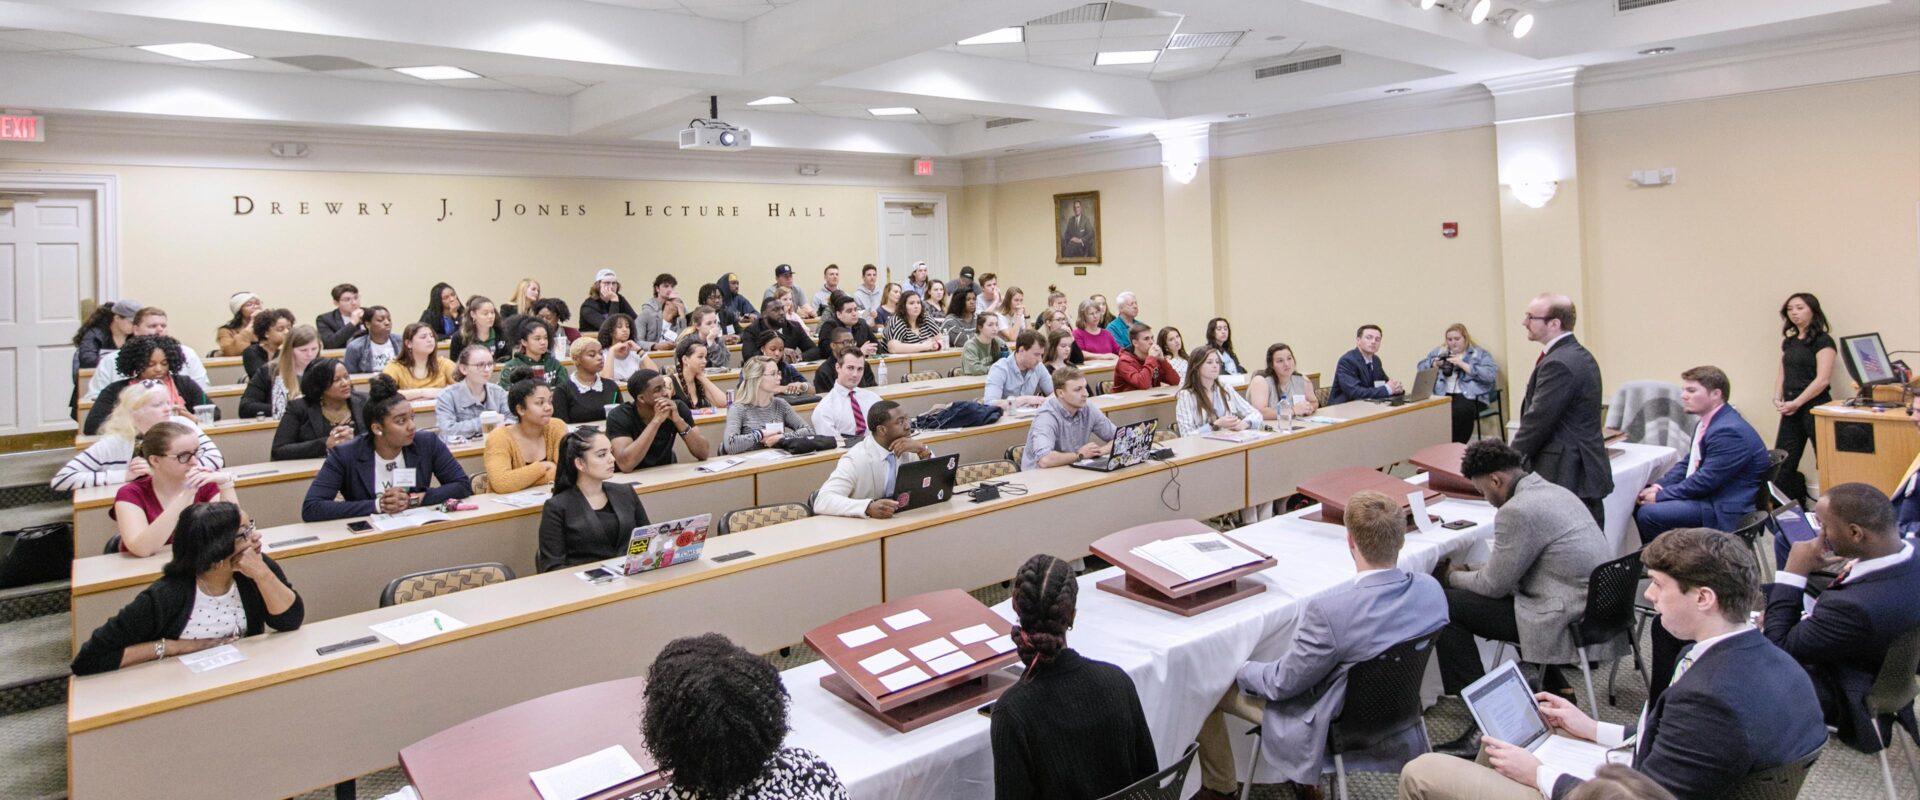 The 2019 Peace Interdisciplinary Conference